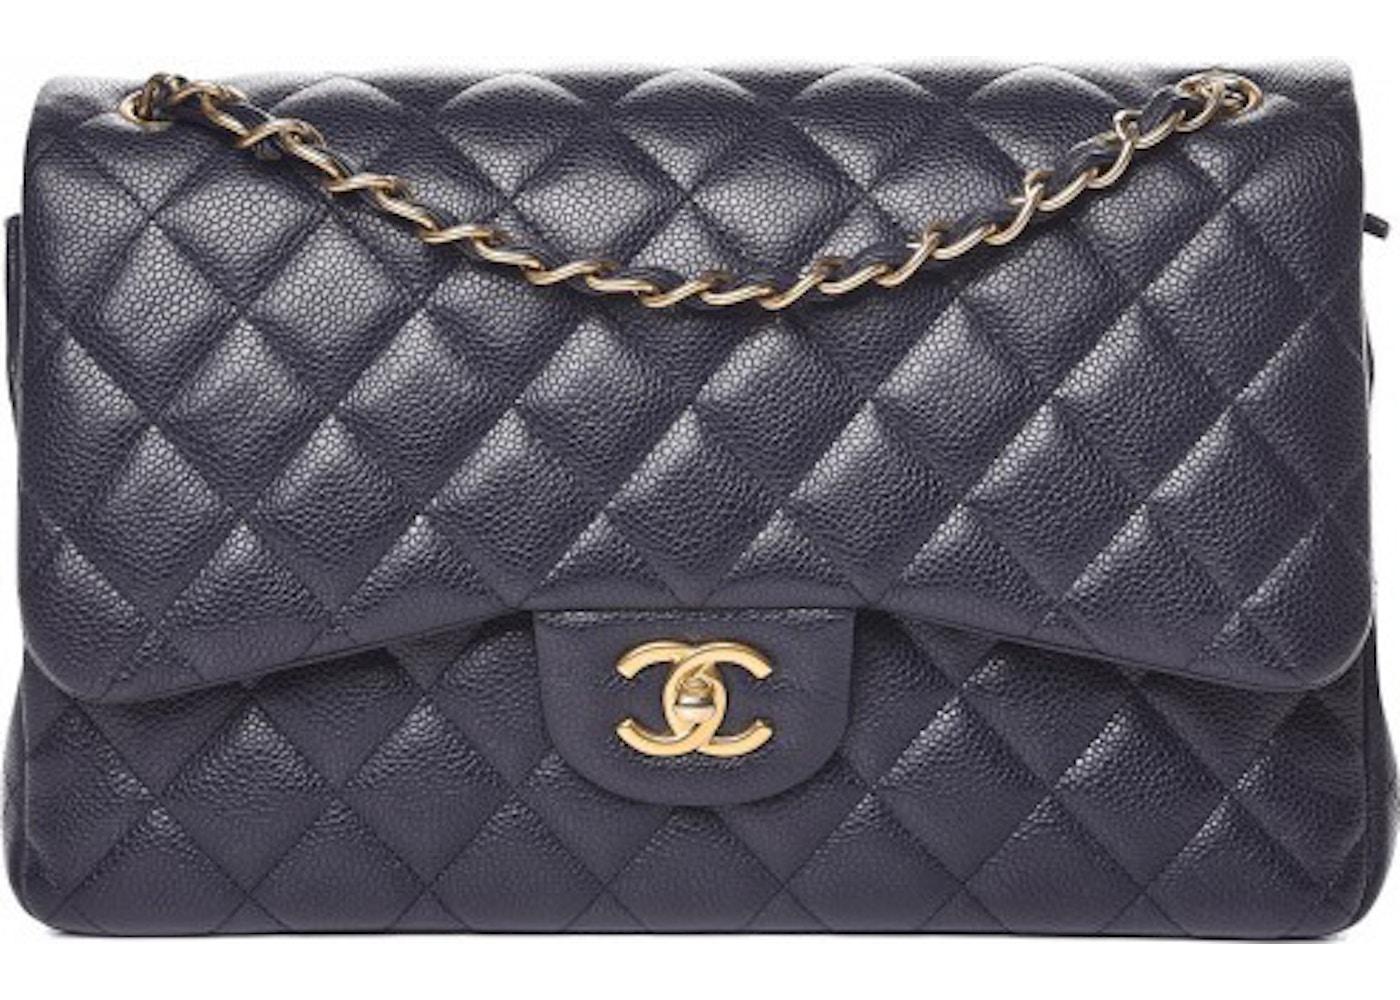 6526a9d2934e Chanel Classic Double Flap Caviar Jumbo Navy